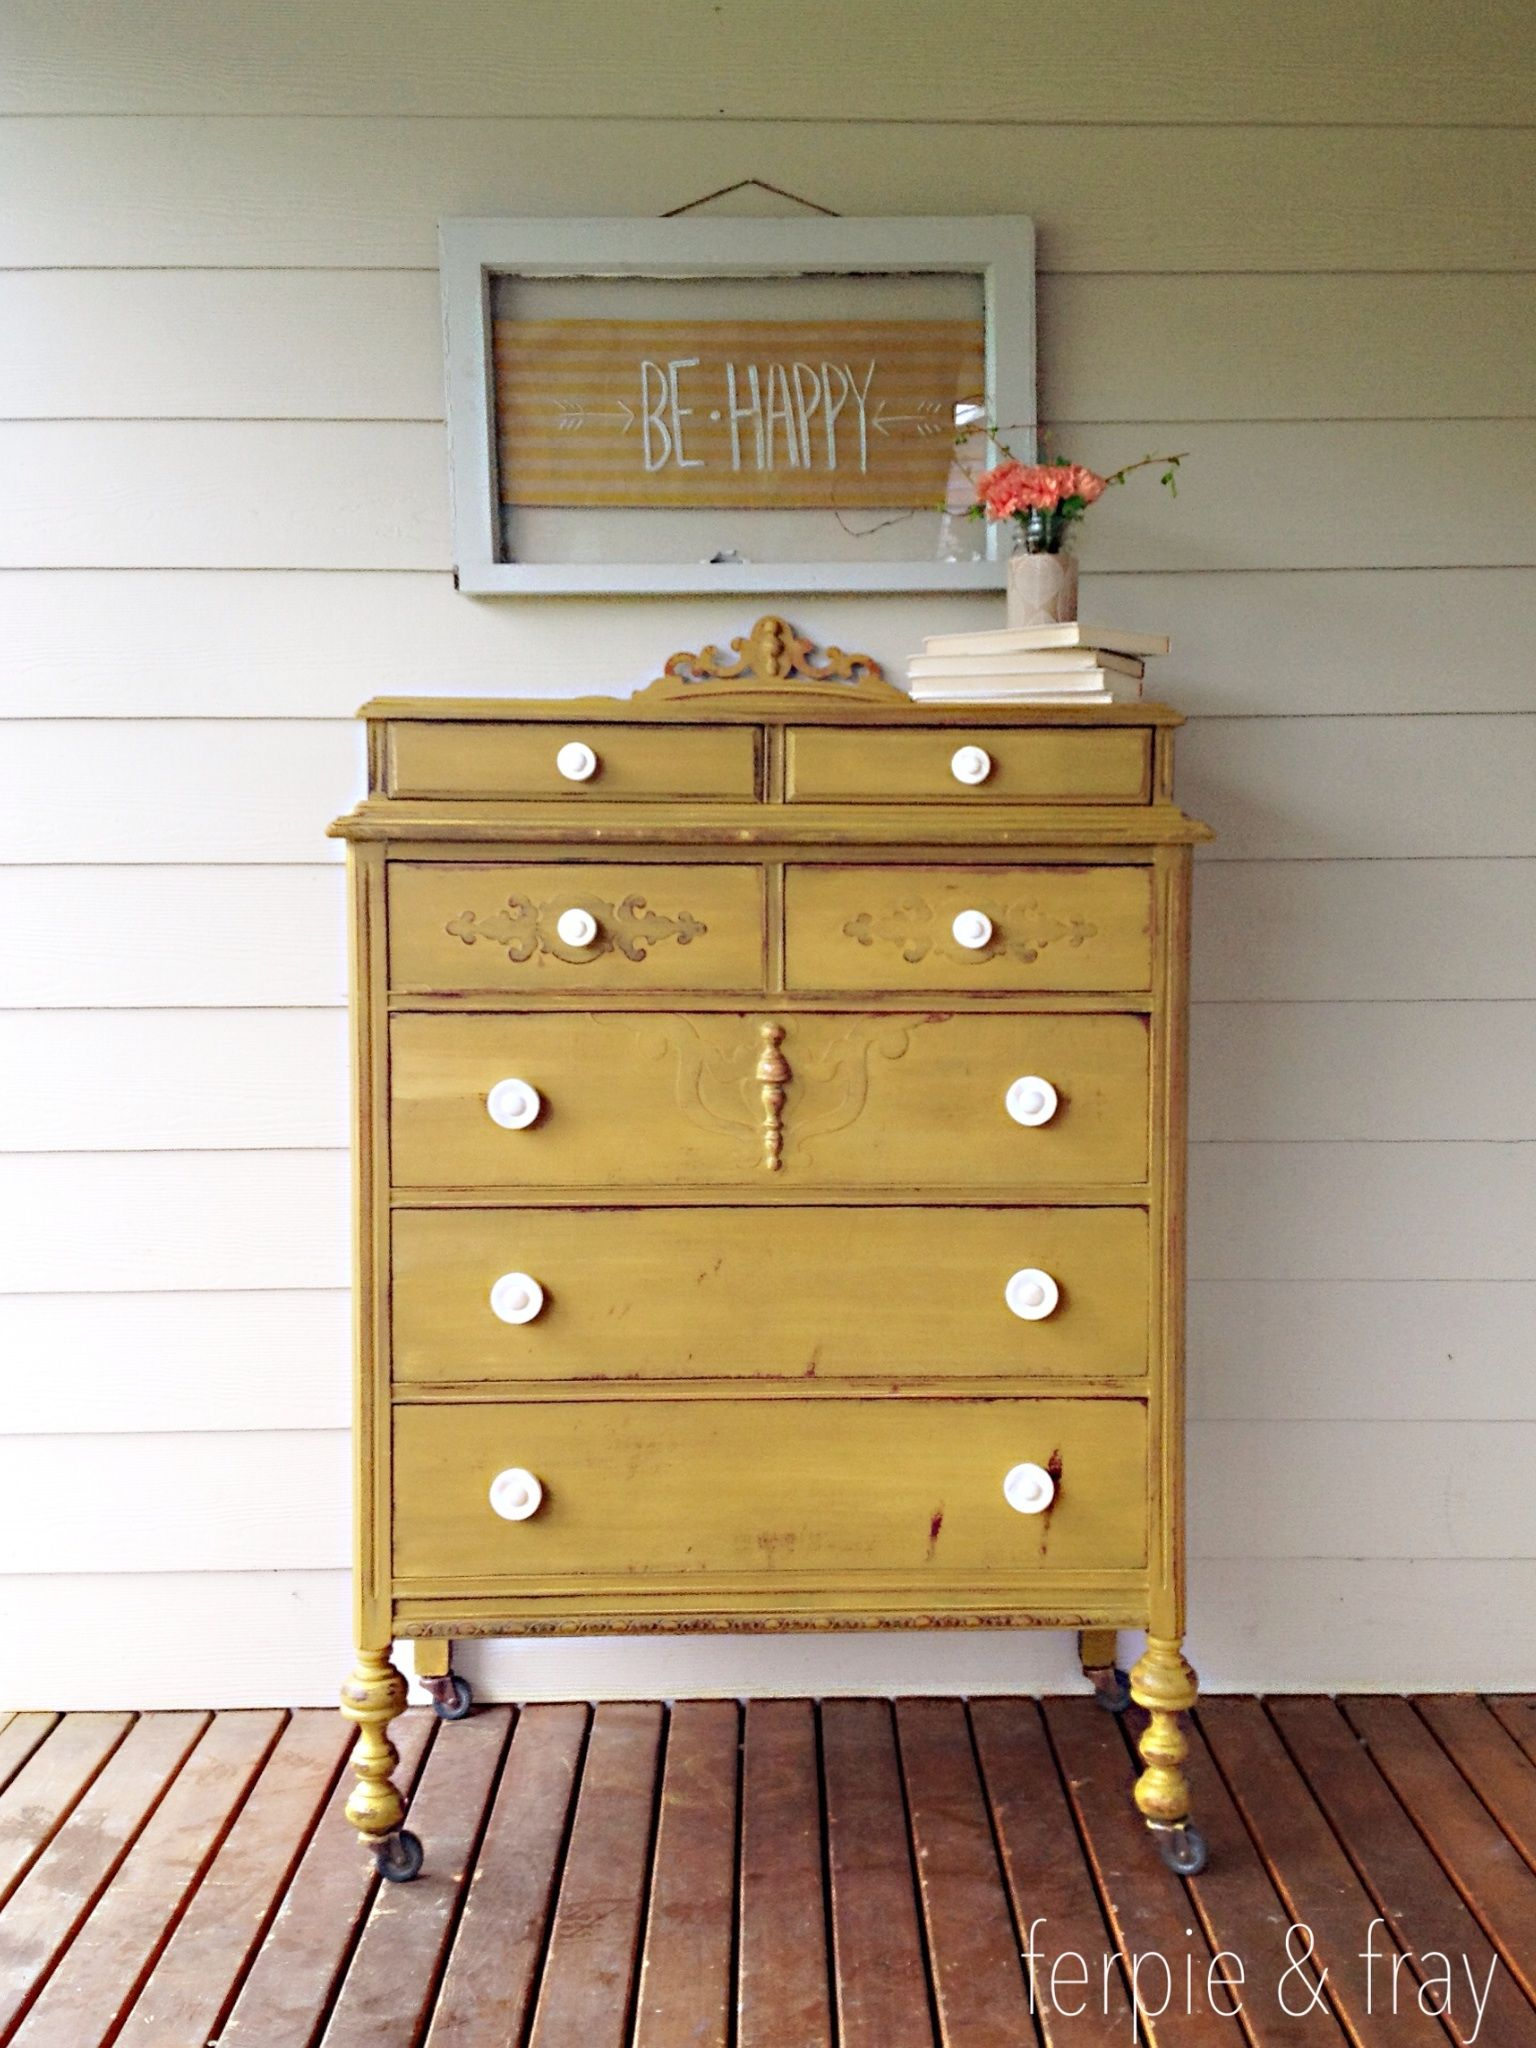 dresser paintedferpie and fray in mustardold fashioned